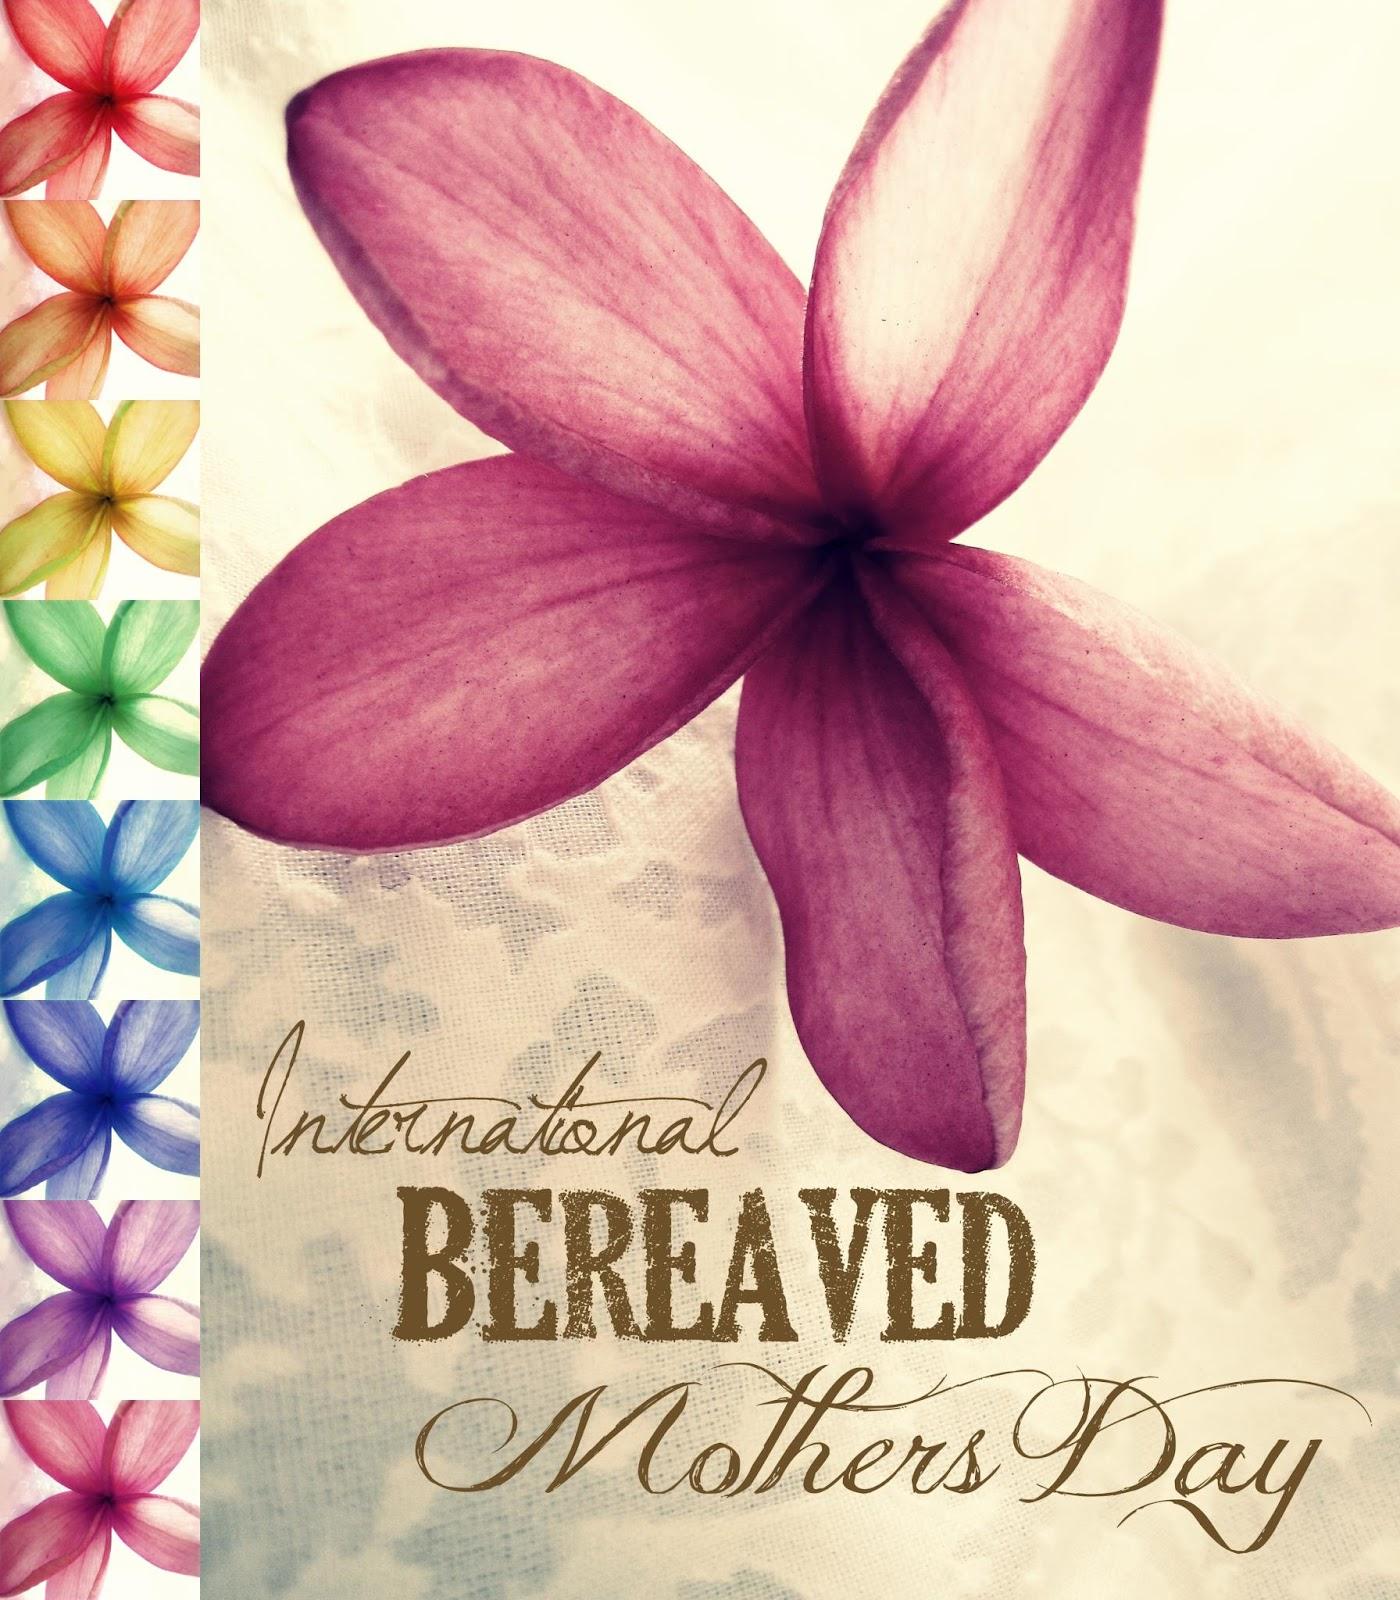 International Bereaved Mothers Day Mamavanelaranl